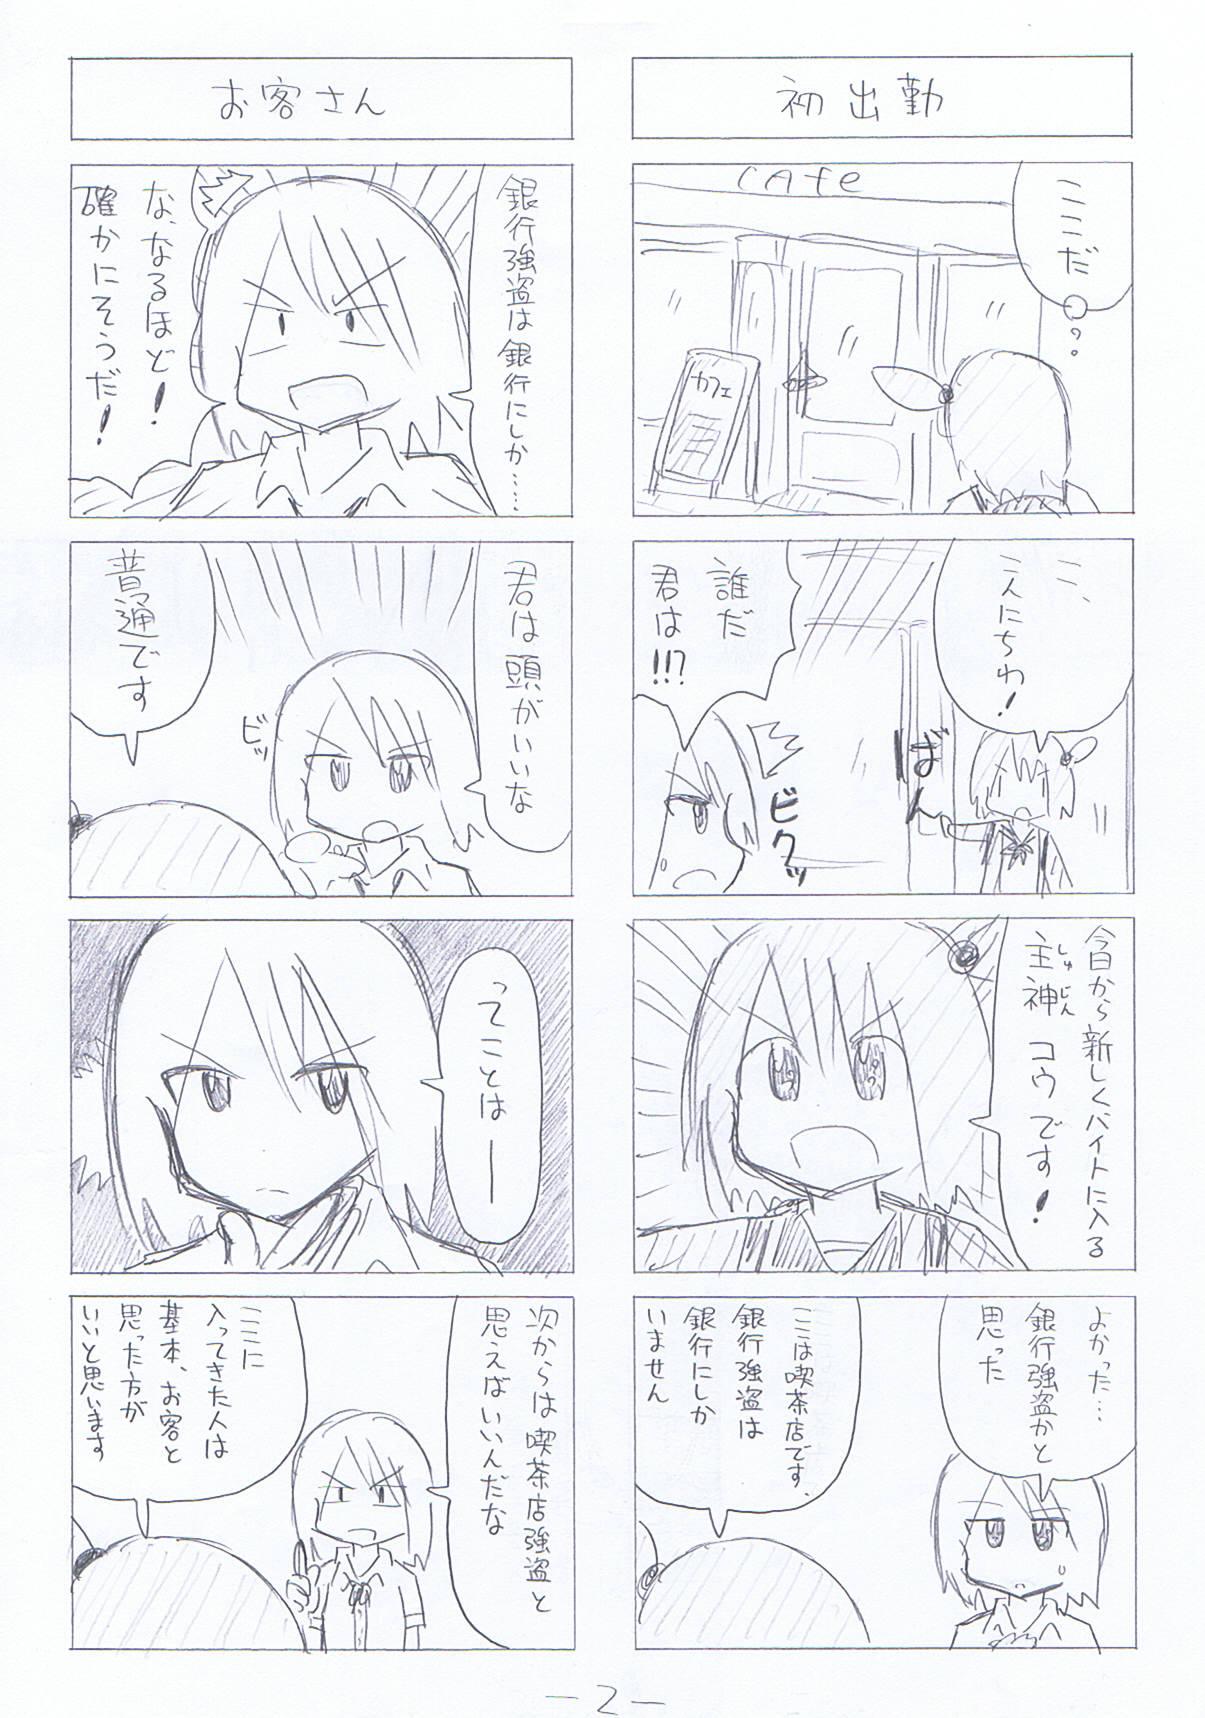 hitotoki-1-2.jpg